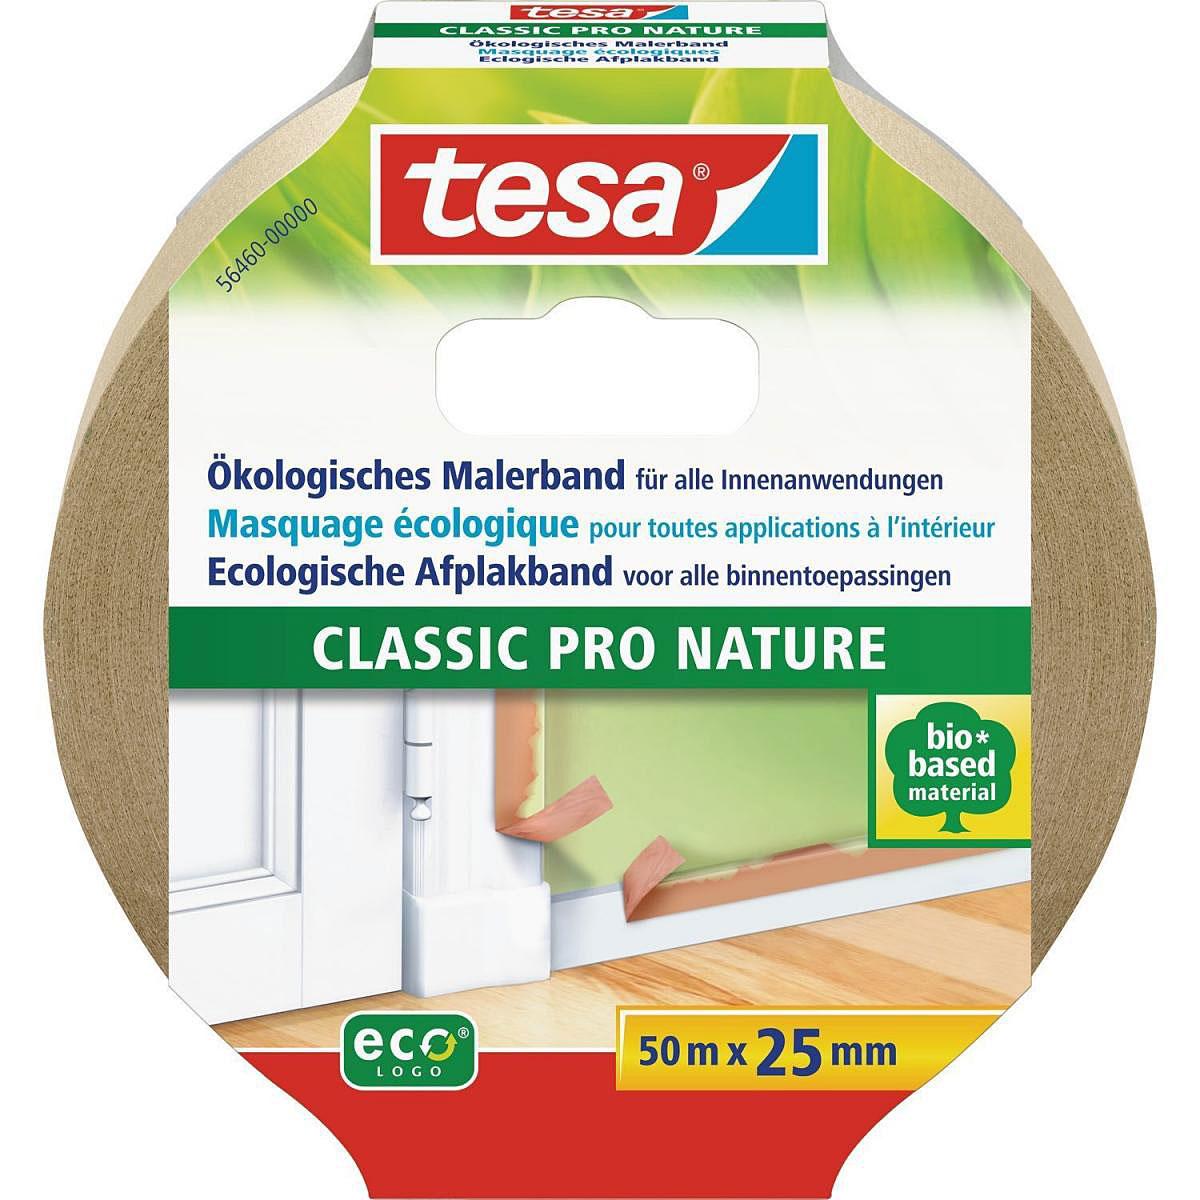 Tesa Maler-Krepp Eco Premium Braun 50 m x 25 mm